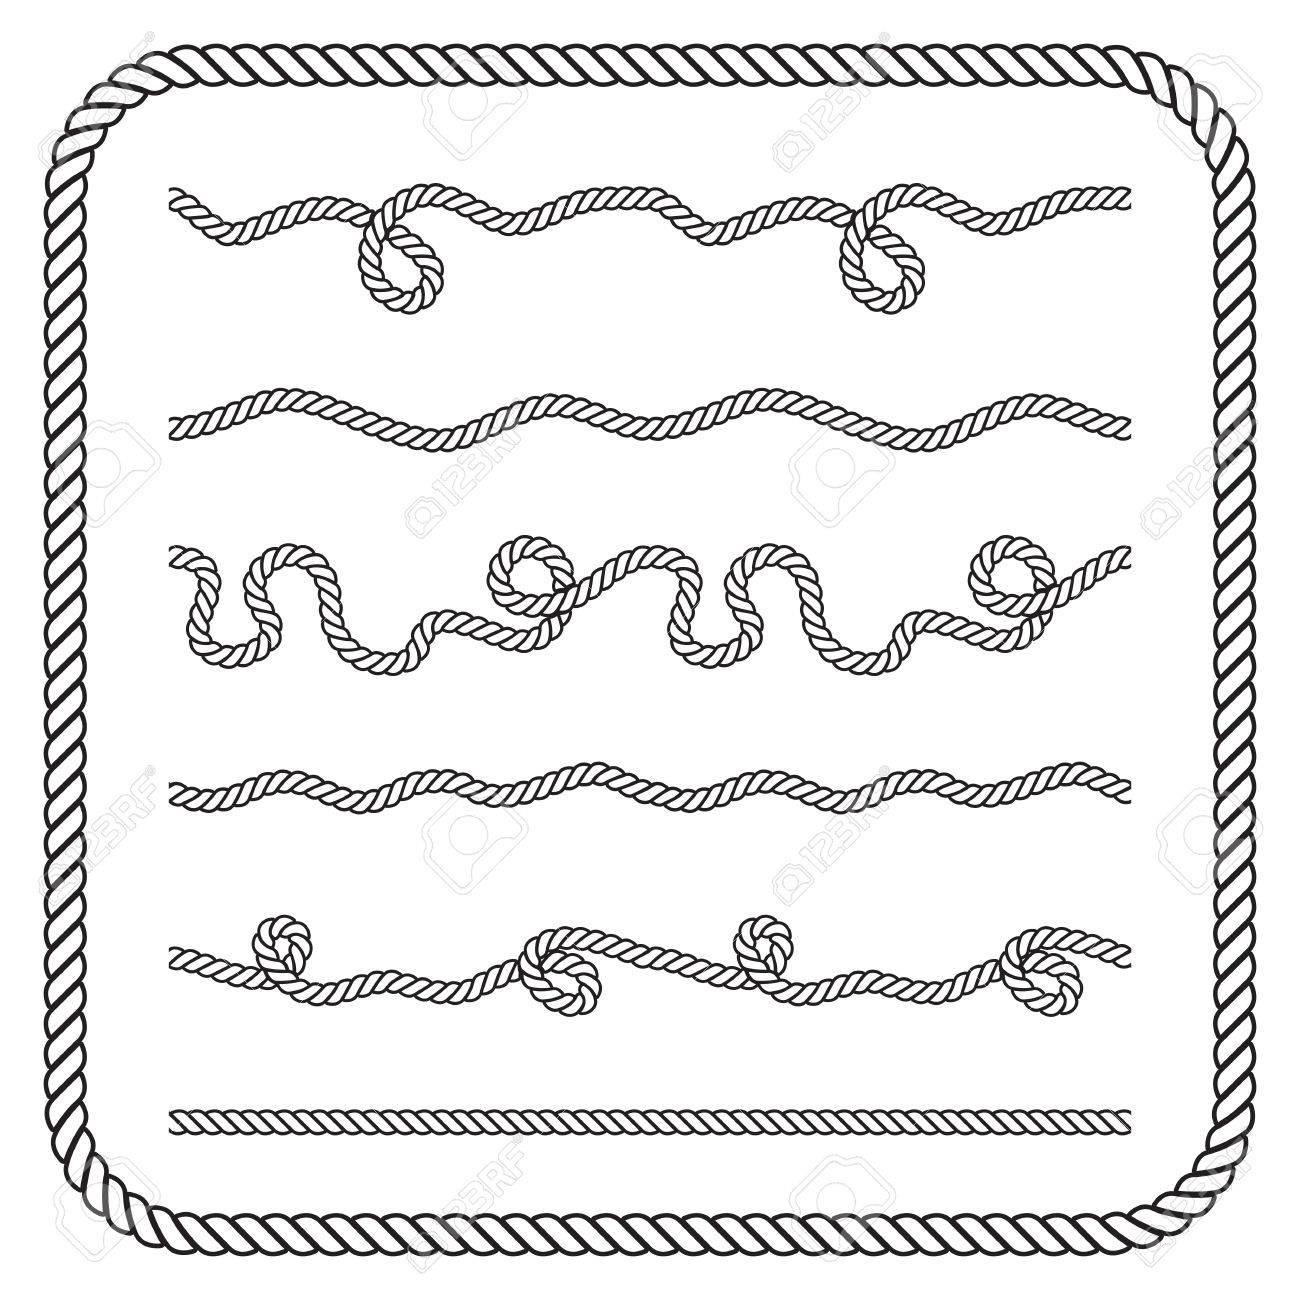 Nautical rope knots. - 42747474